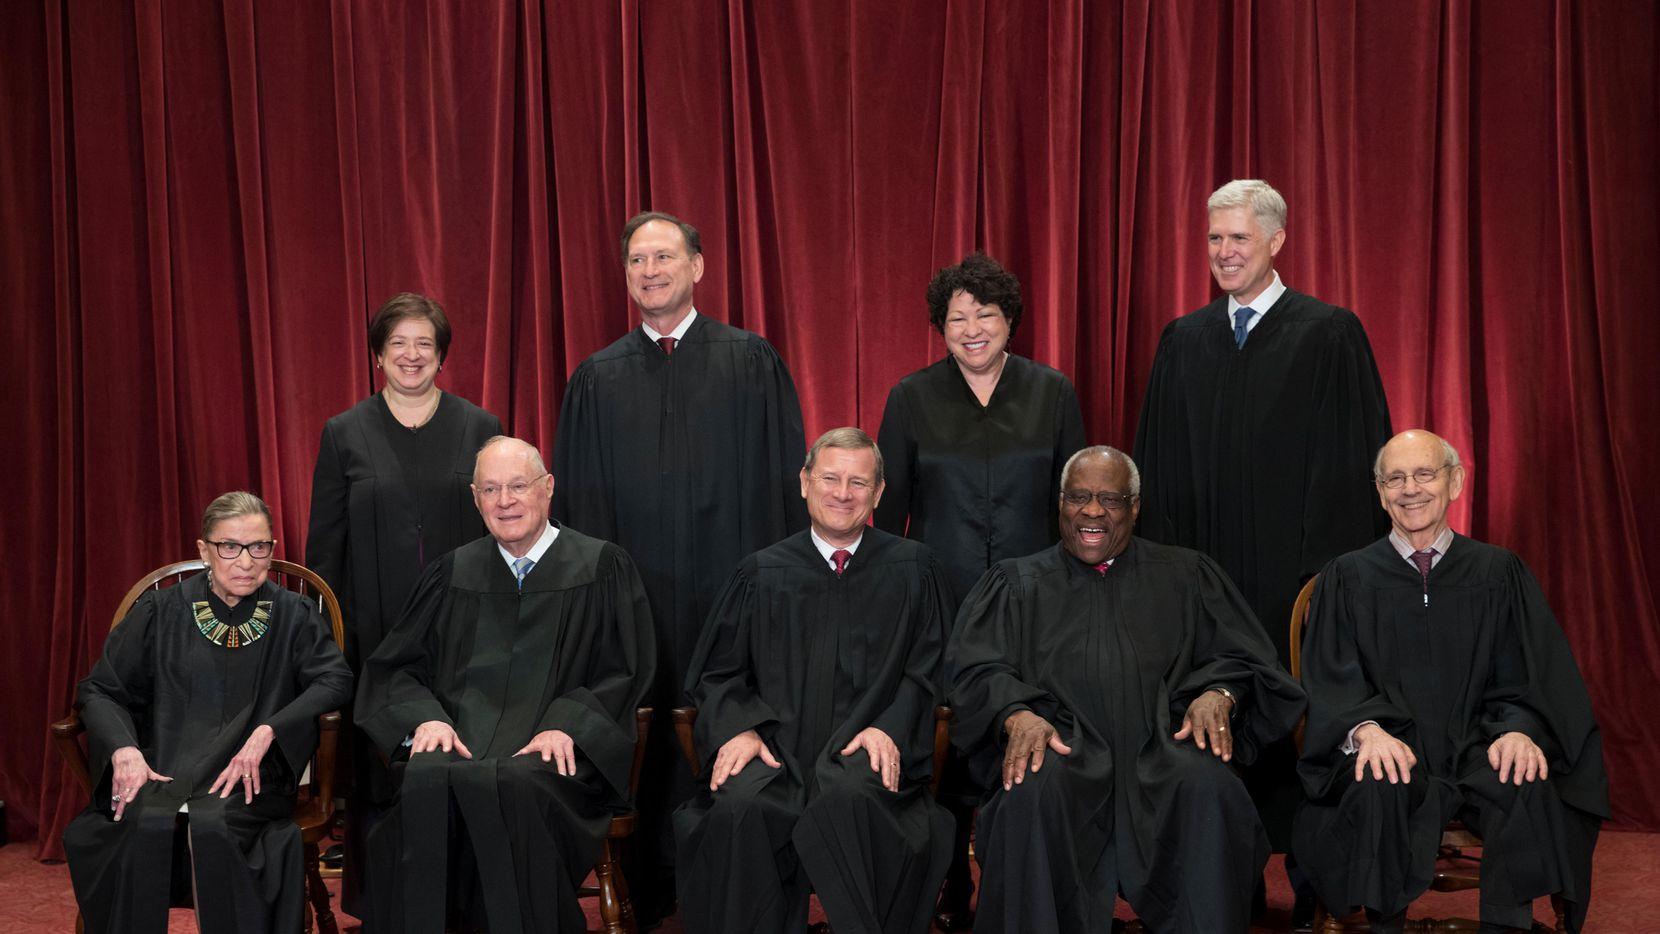 La Corte Suprema en foto oficial: (Arriba, desde la izq.) Elena Kagan, Samuel Alito, Sonia Sotomayor y Neil Gorsuch.(Sentados, desde la izq) Ruth Bader Ginsburg, Anthony Kennedy, John Roberts, Clarence Thomas y Stephen Breyer. (AP/J. SCOTT APPLEWHITE)